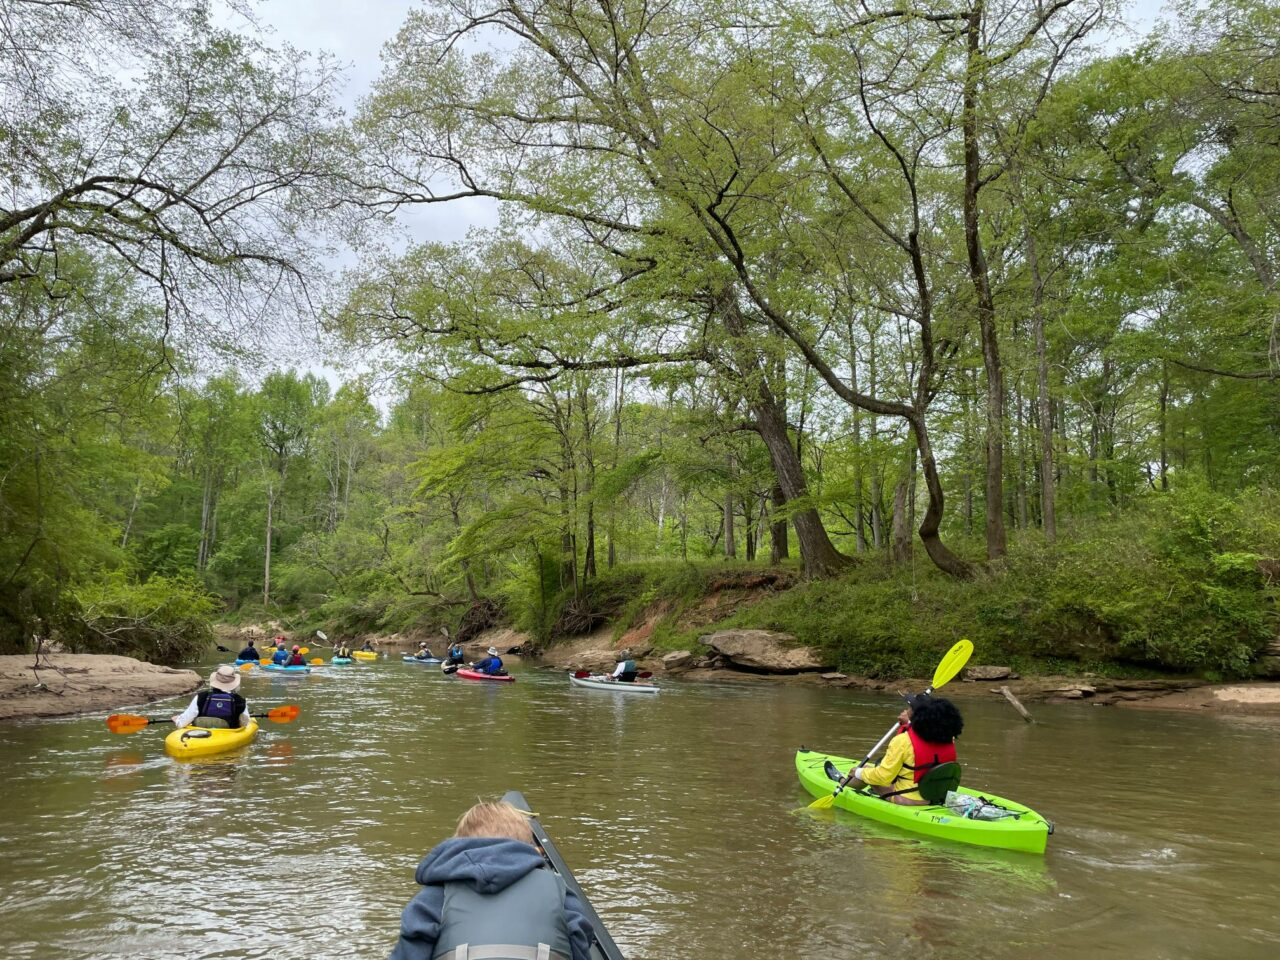 South-River-Paddle-1280x960.jpg